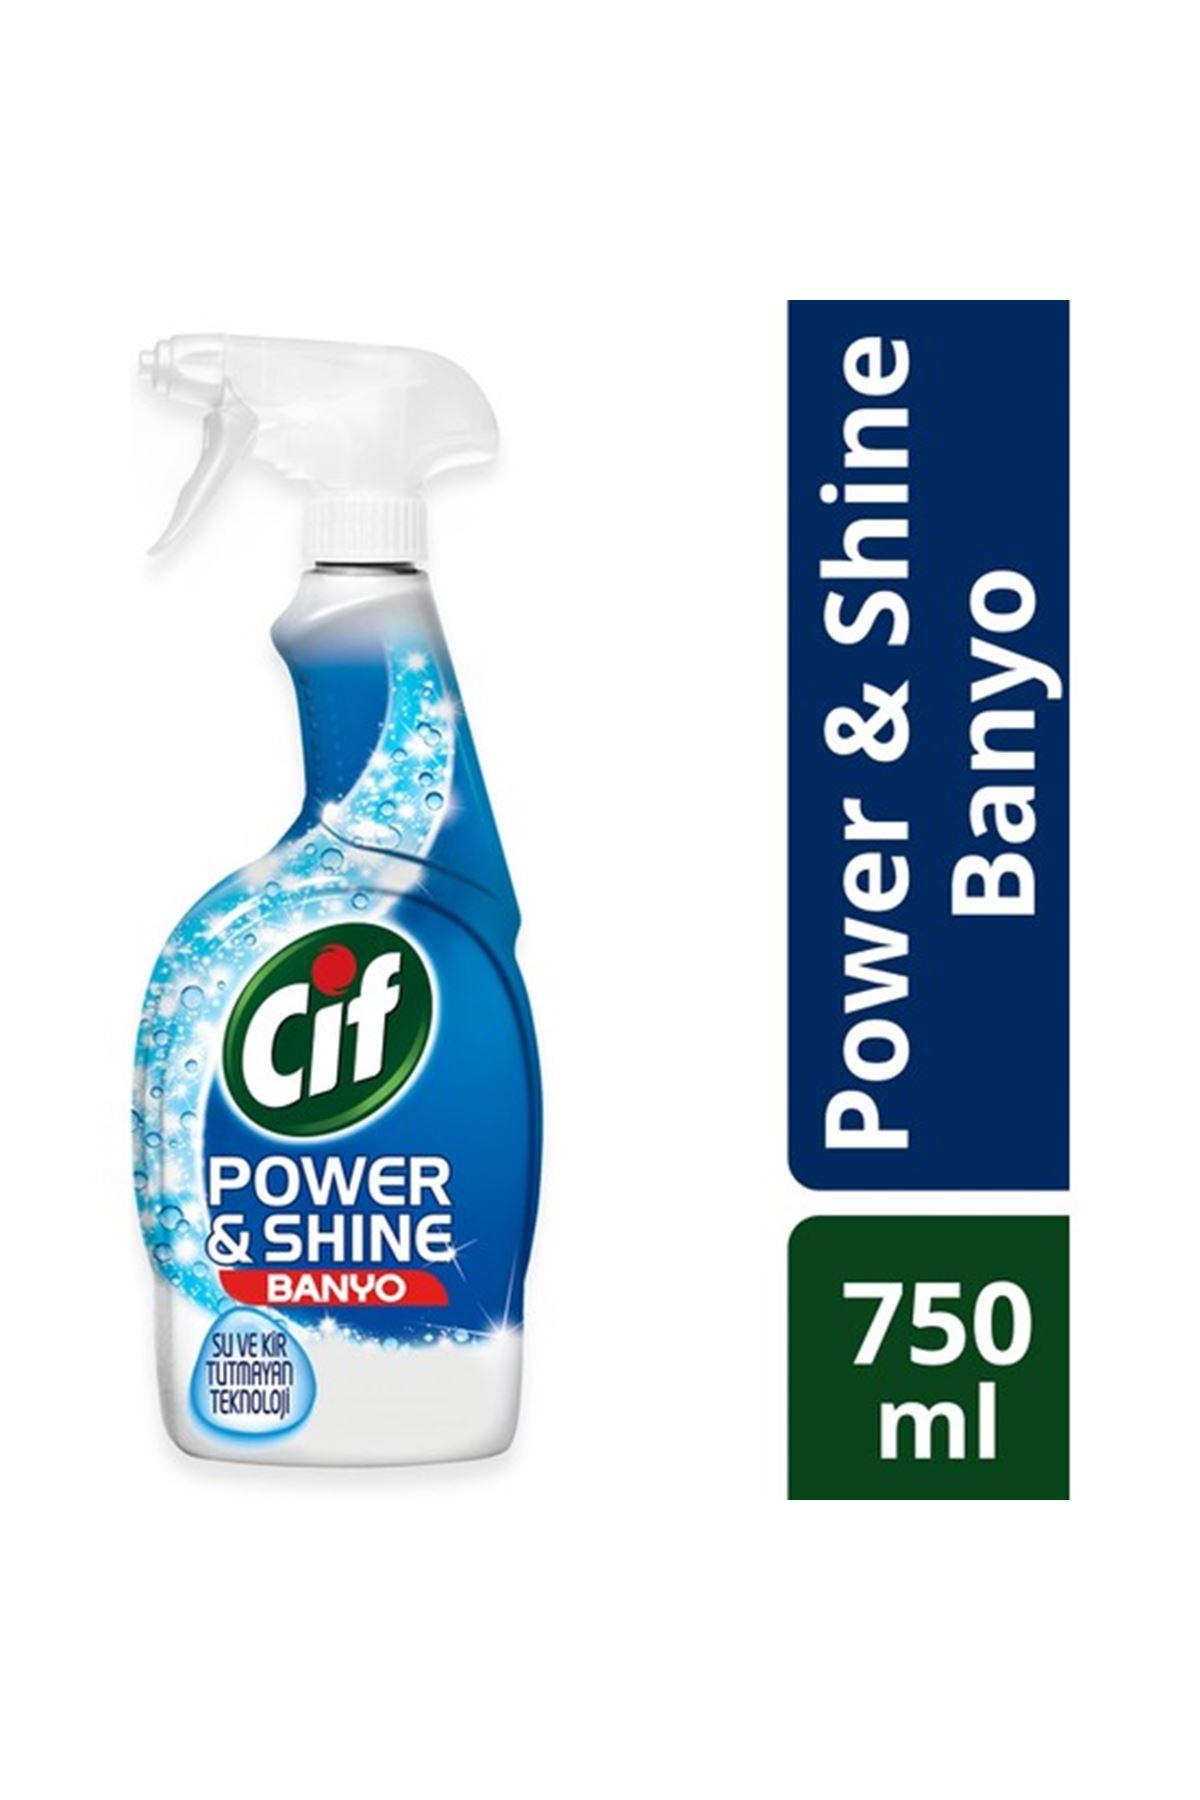 Cif Power & Shine Banyo Sprey Temizleyici 750 ml